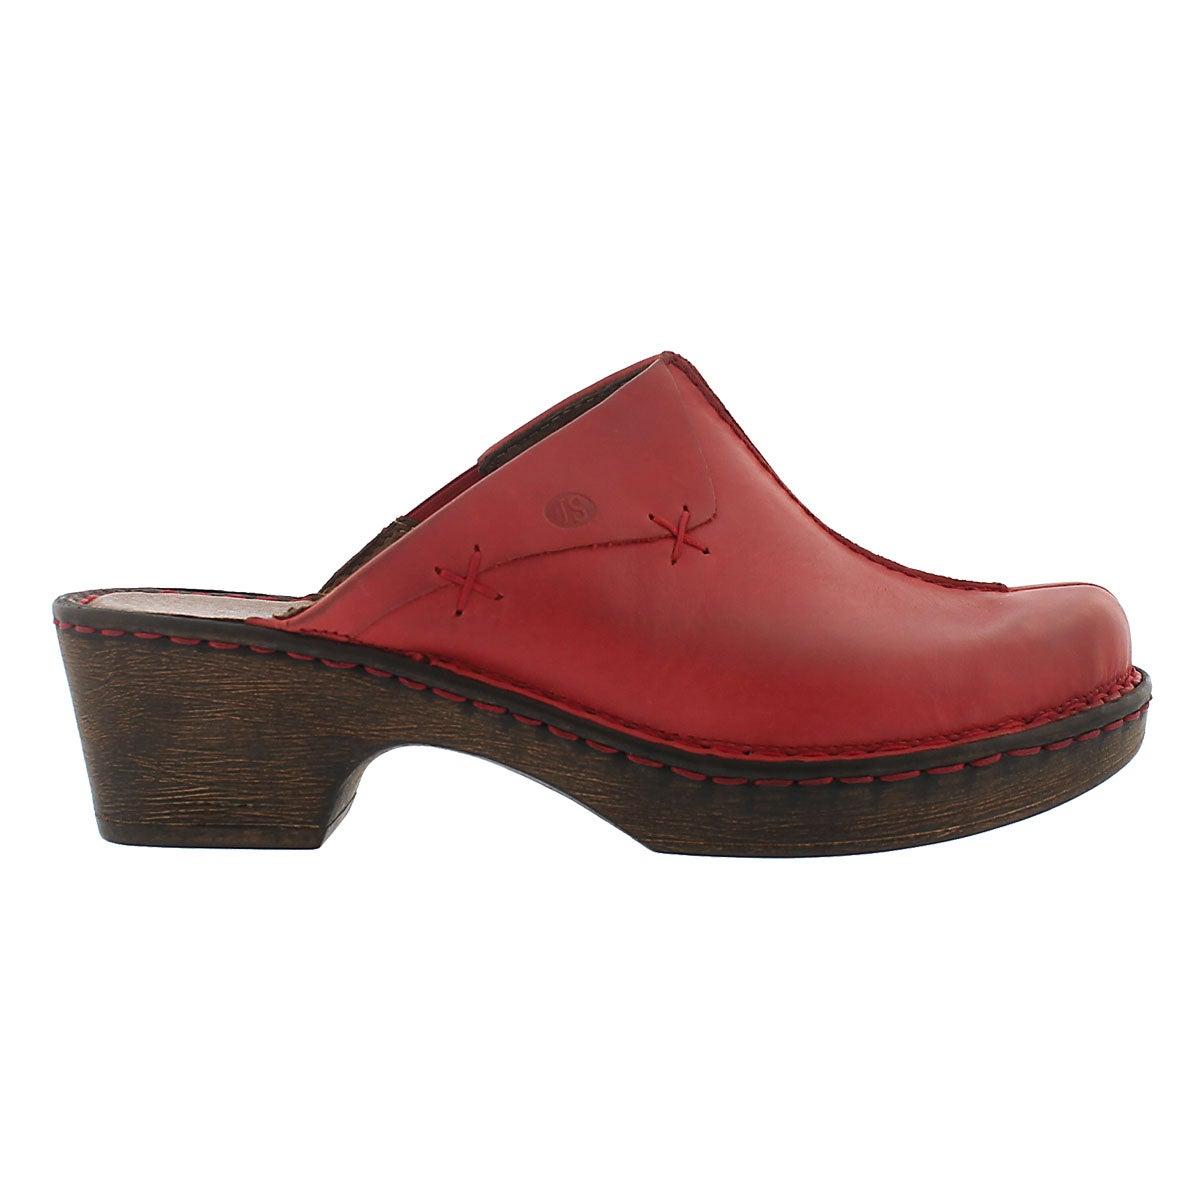 Lds Rebecca 13 red casual clog